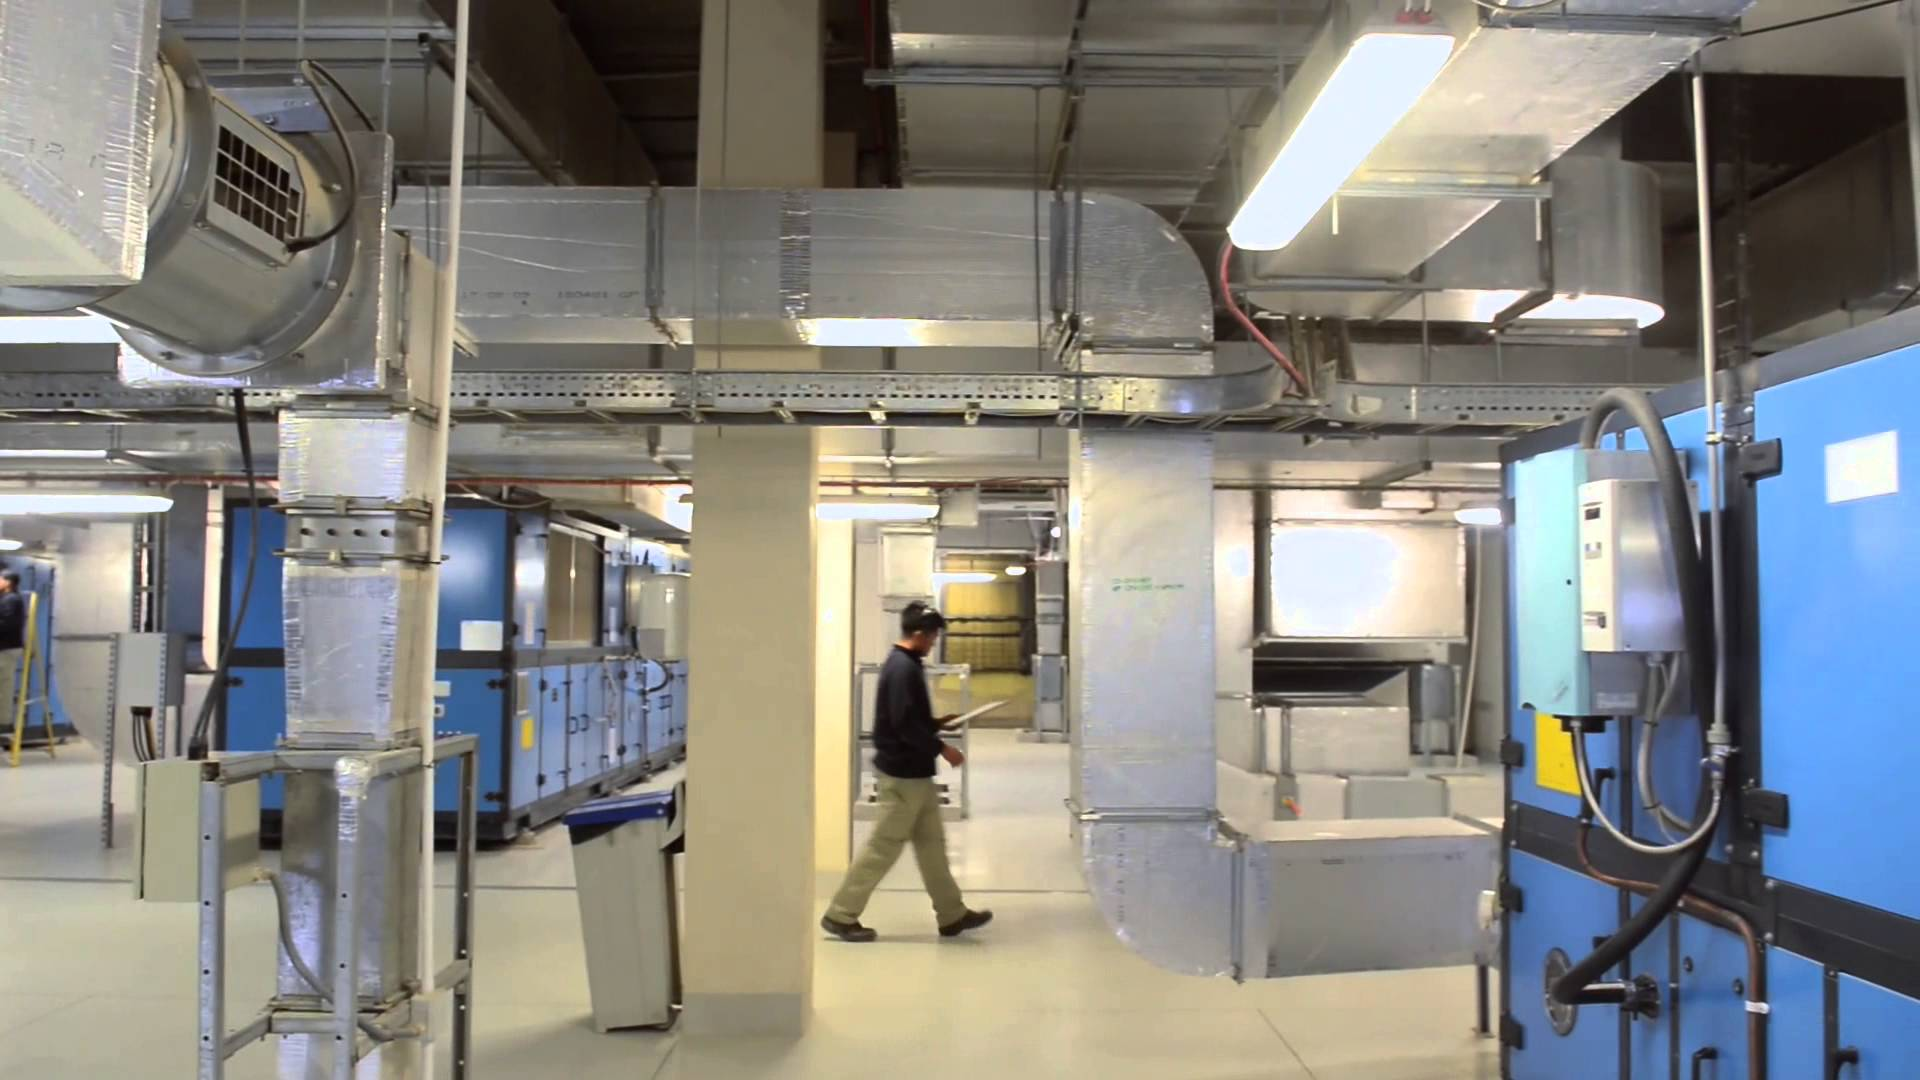 Facility Maintenance professional -